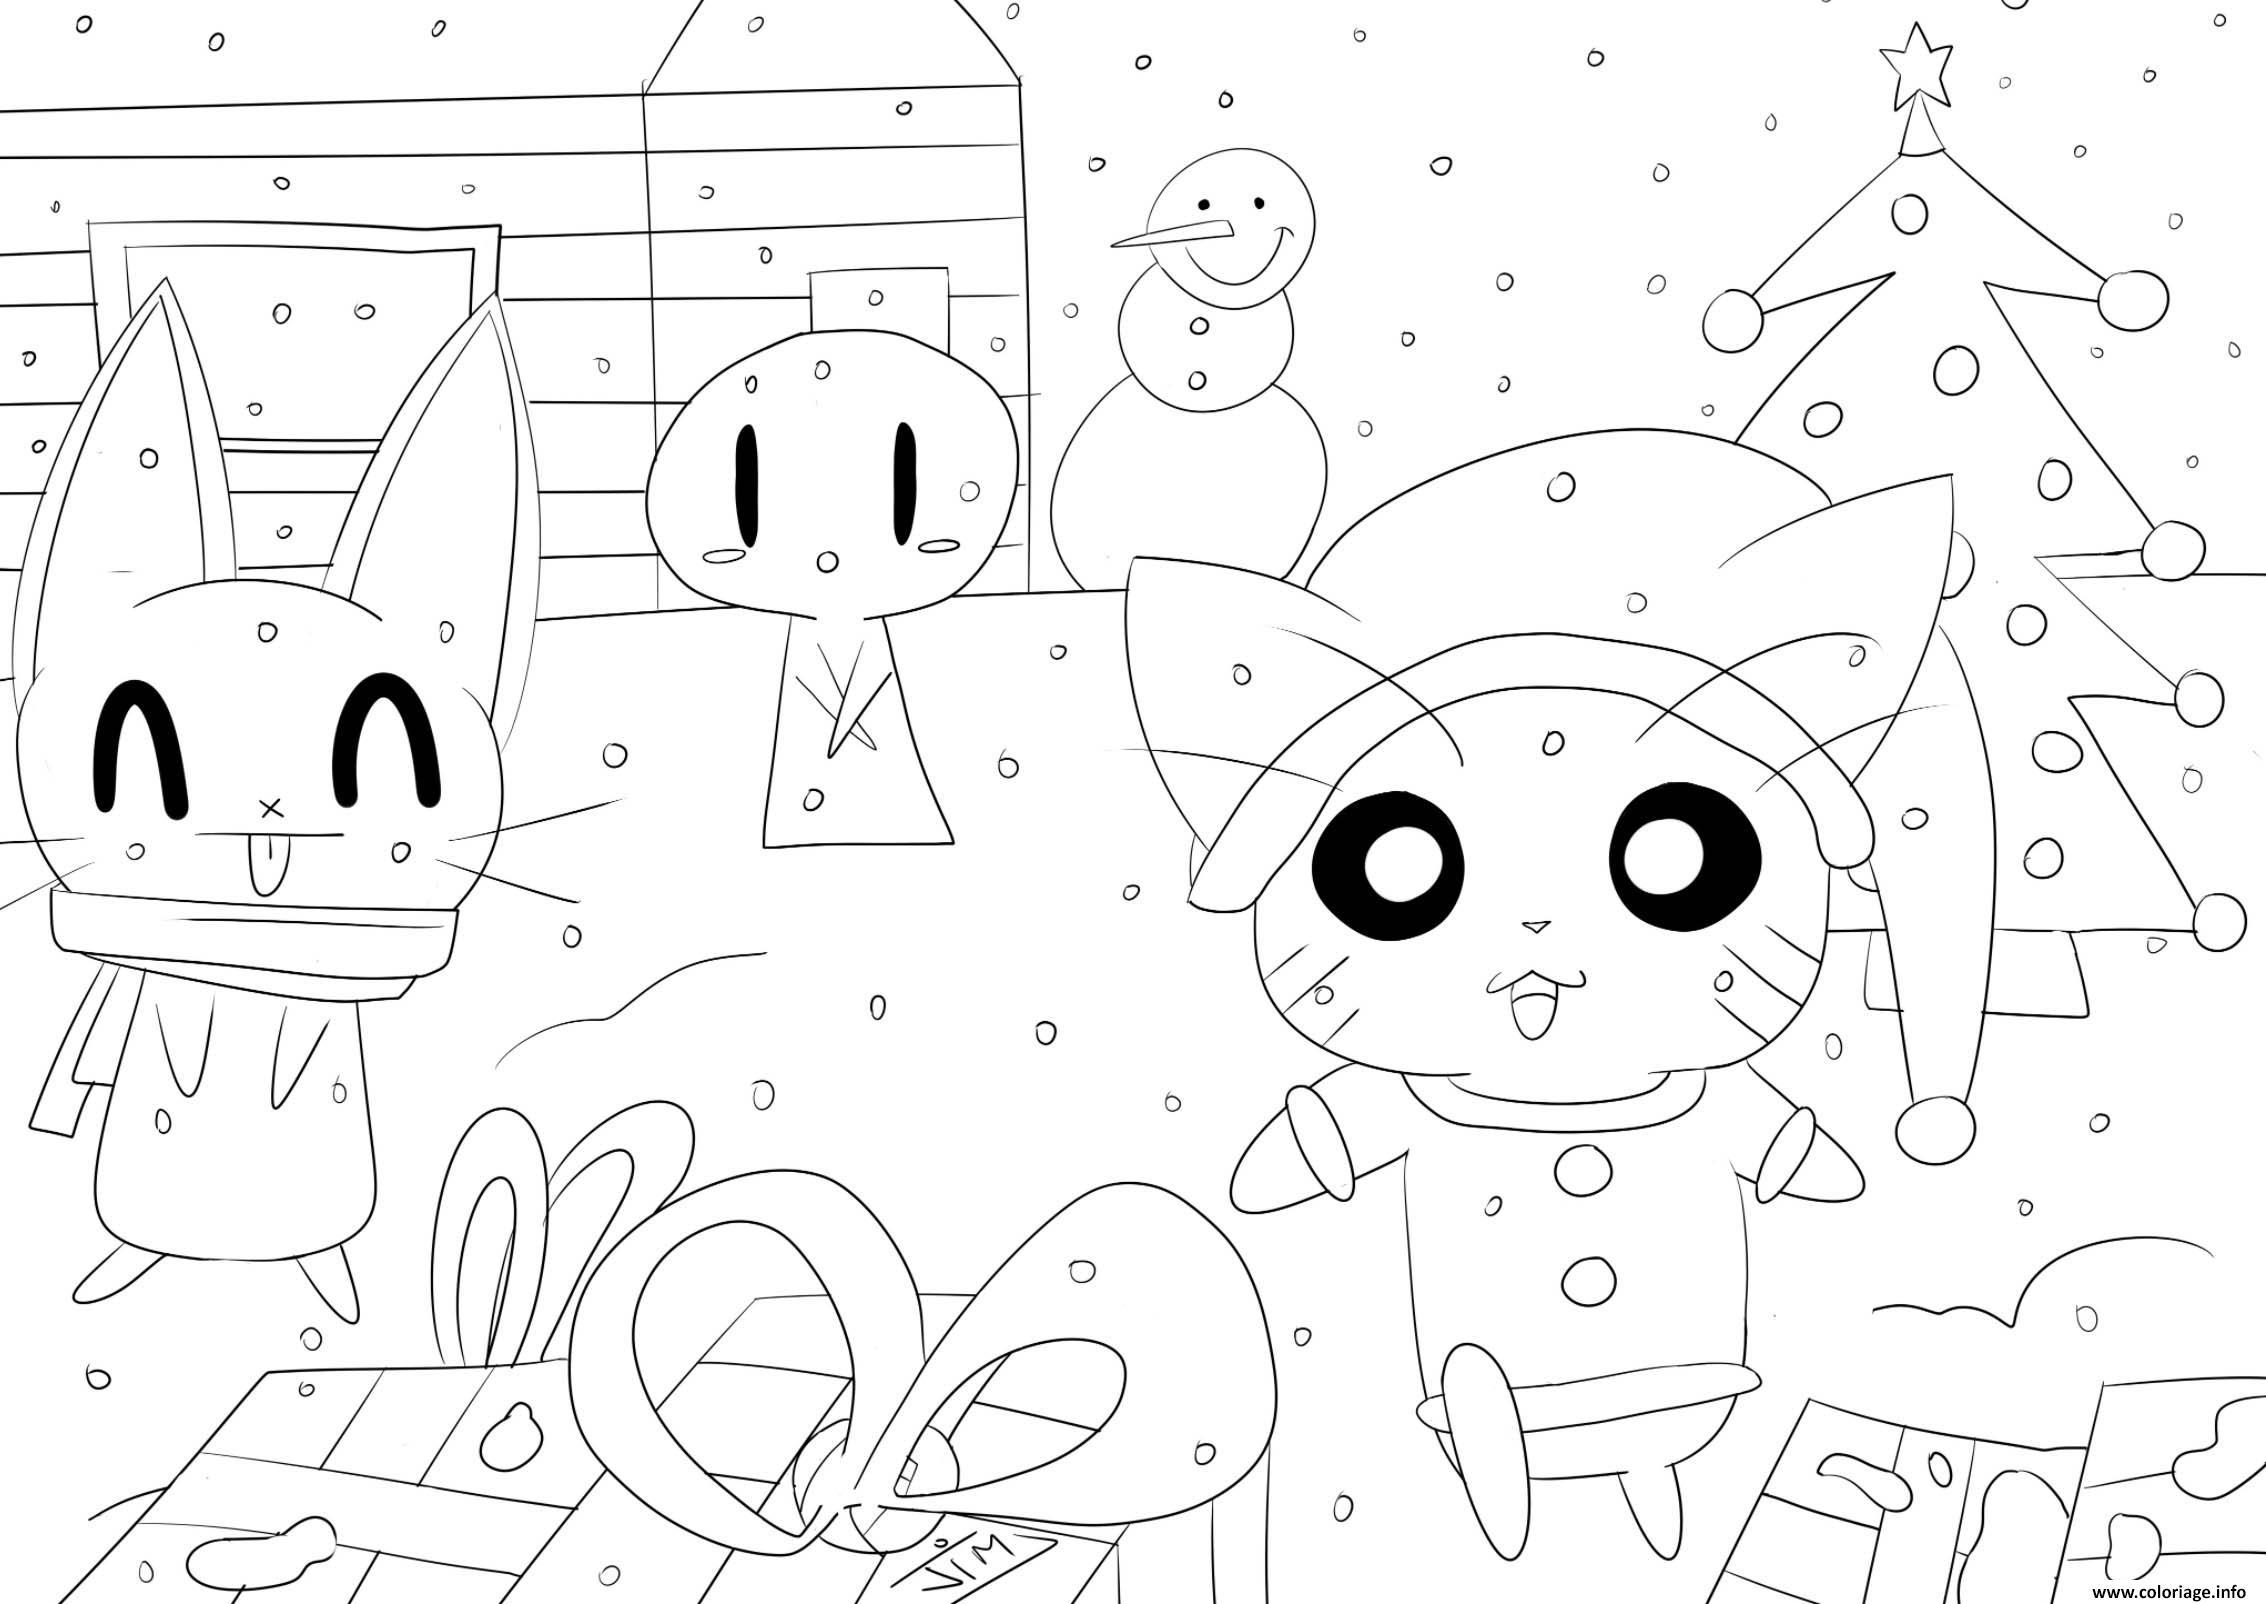 Coloriage Kawaii Noel Par Jim Dessin